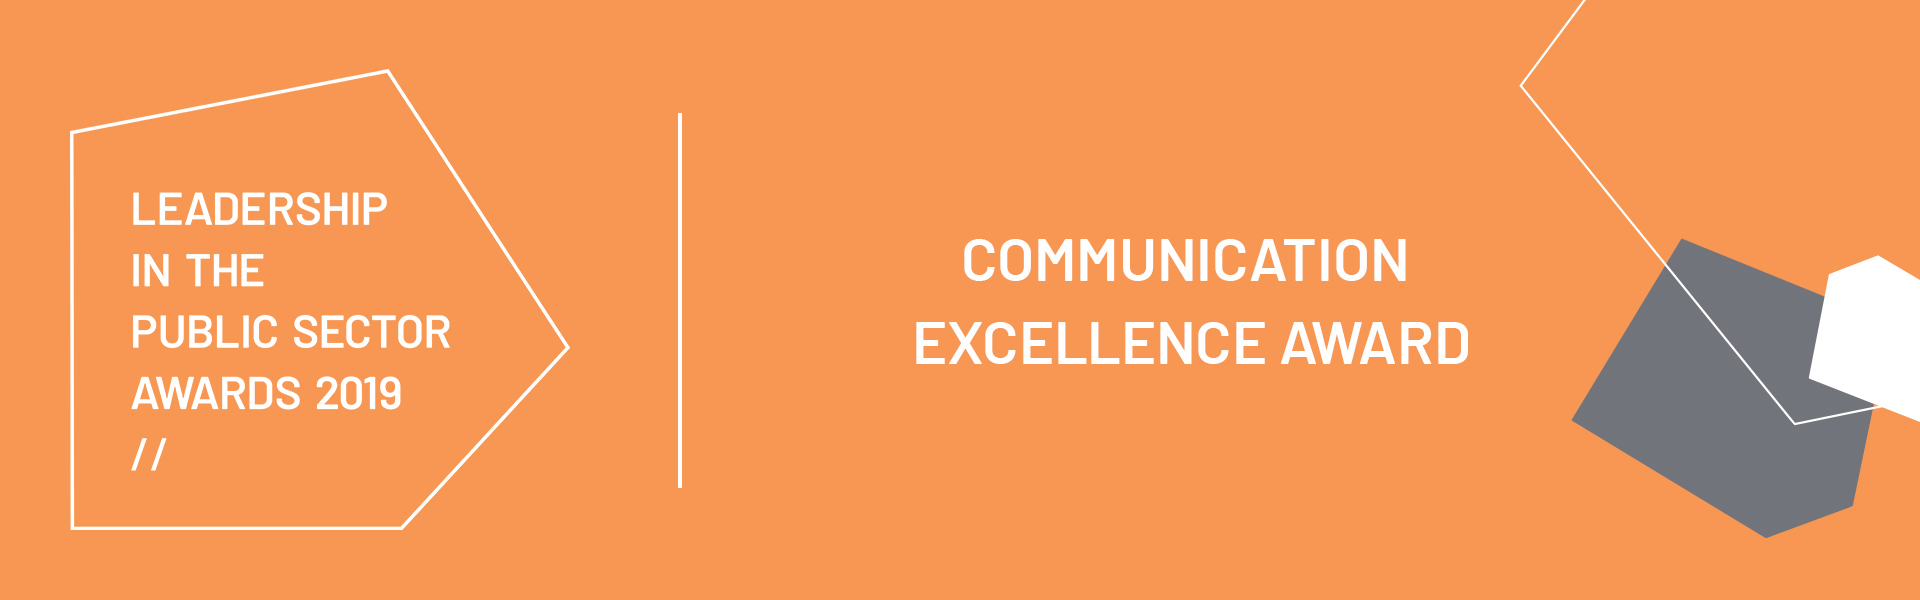 Communication Excellence_1920x600_V1.jpg